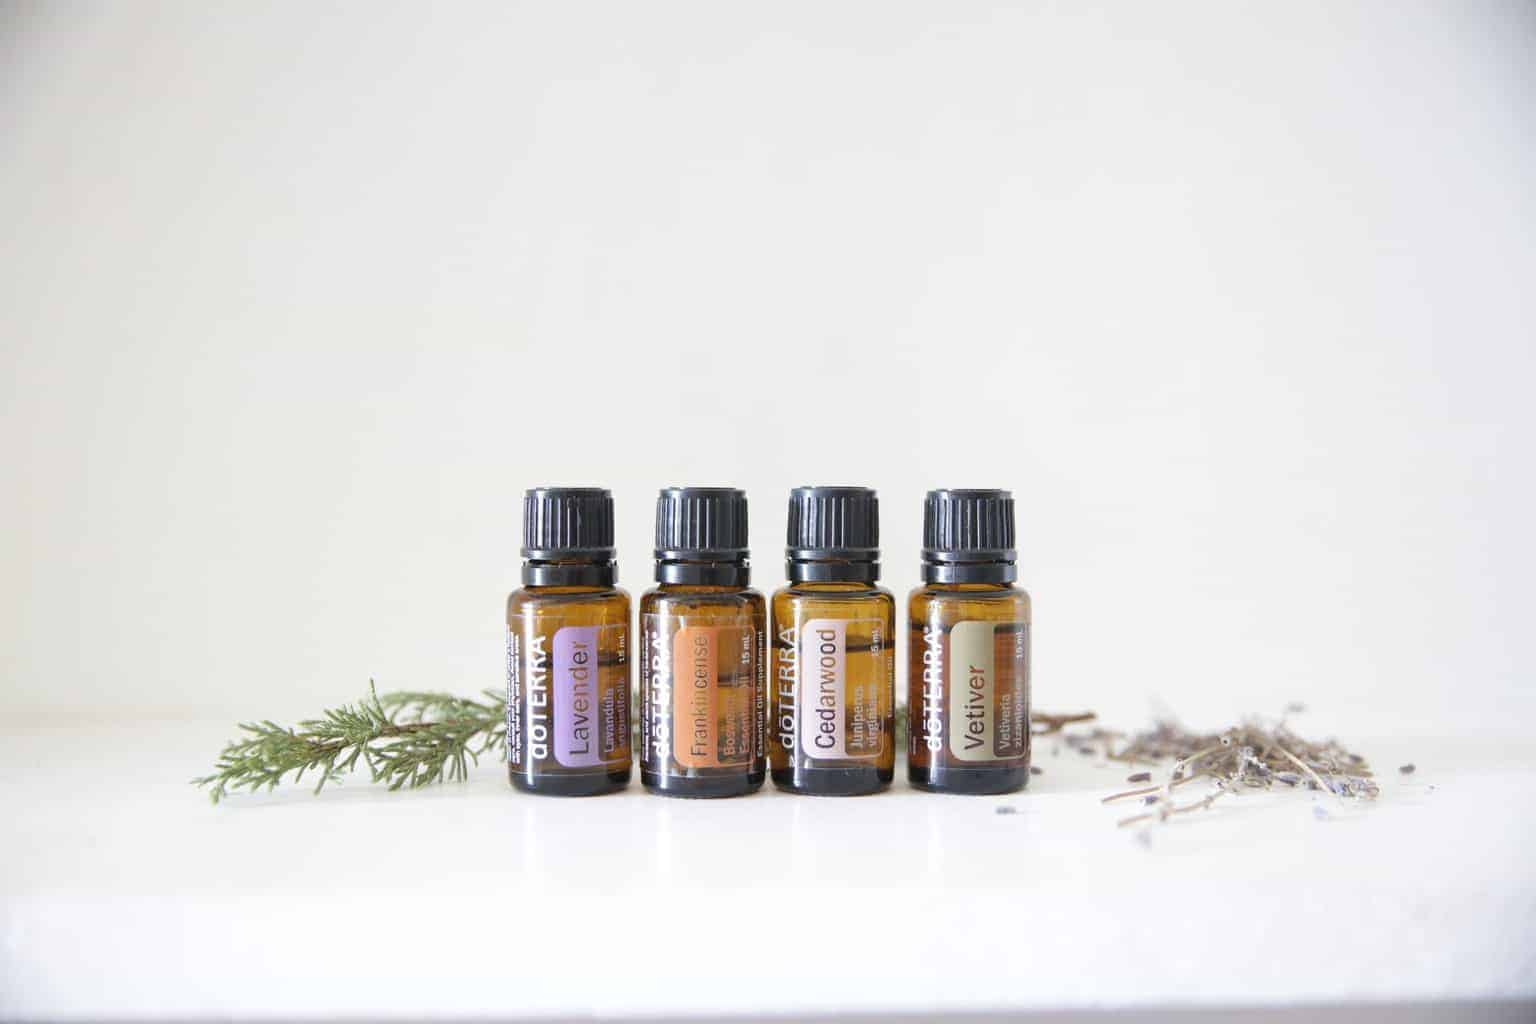 lavender frankincence cedarwood and vetiver oils in 15ml glass bottles